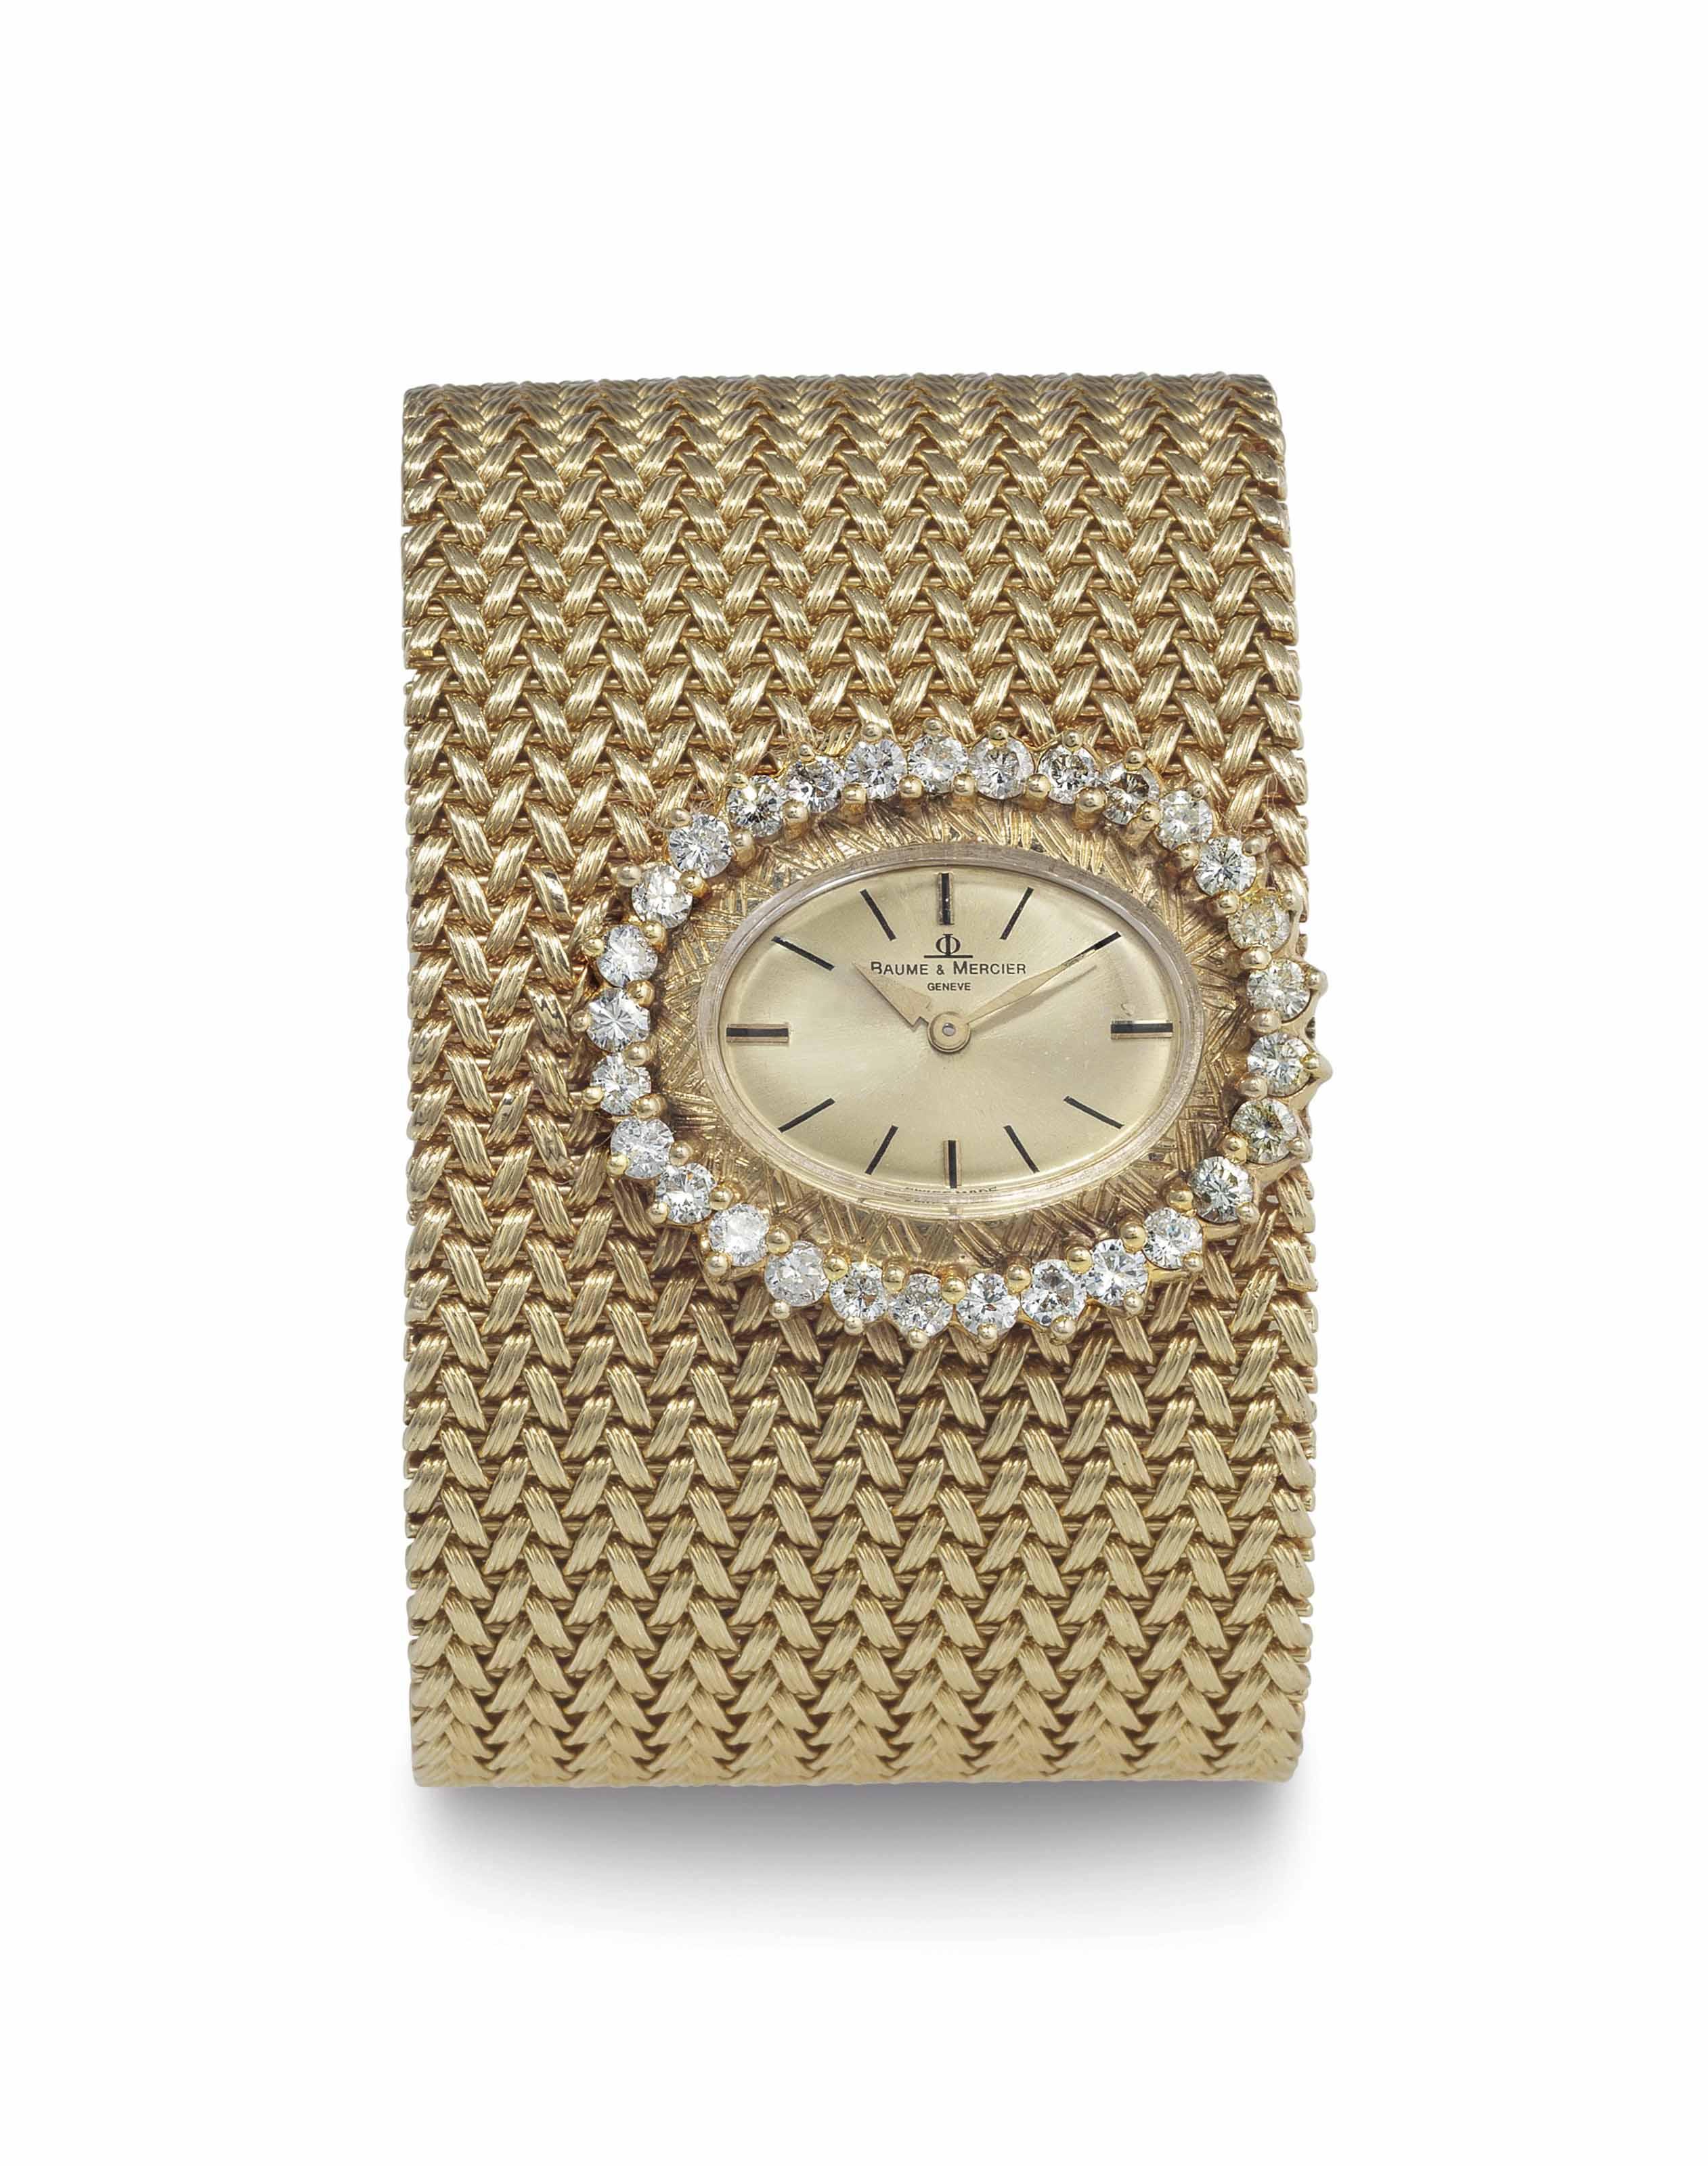 Baume & Mercier. A Lady's 14k Gold and Diamond-Set Cuff Bracelet Watch